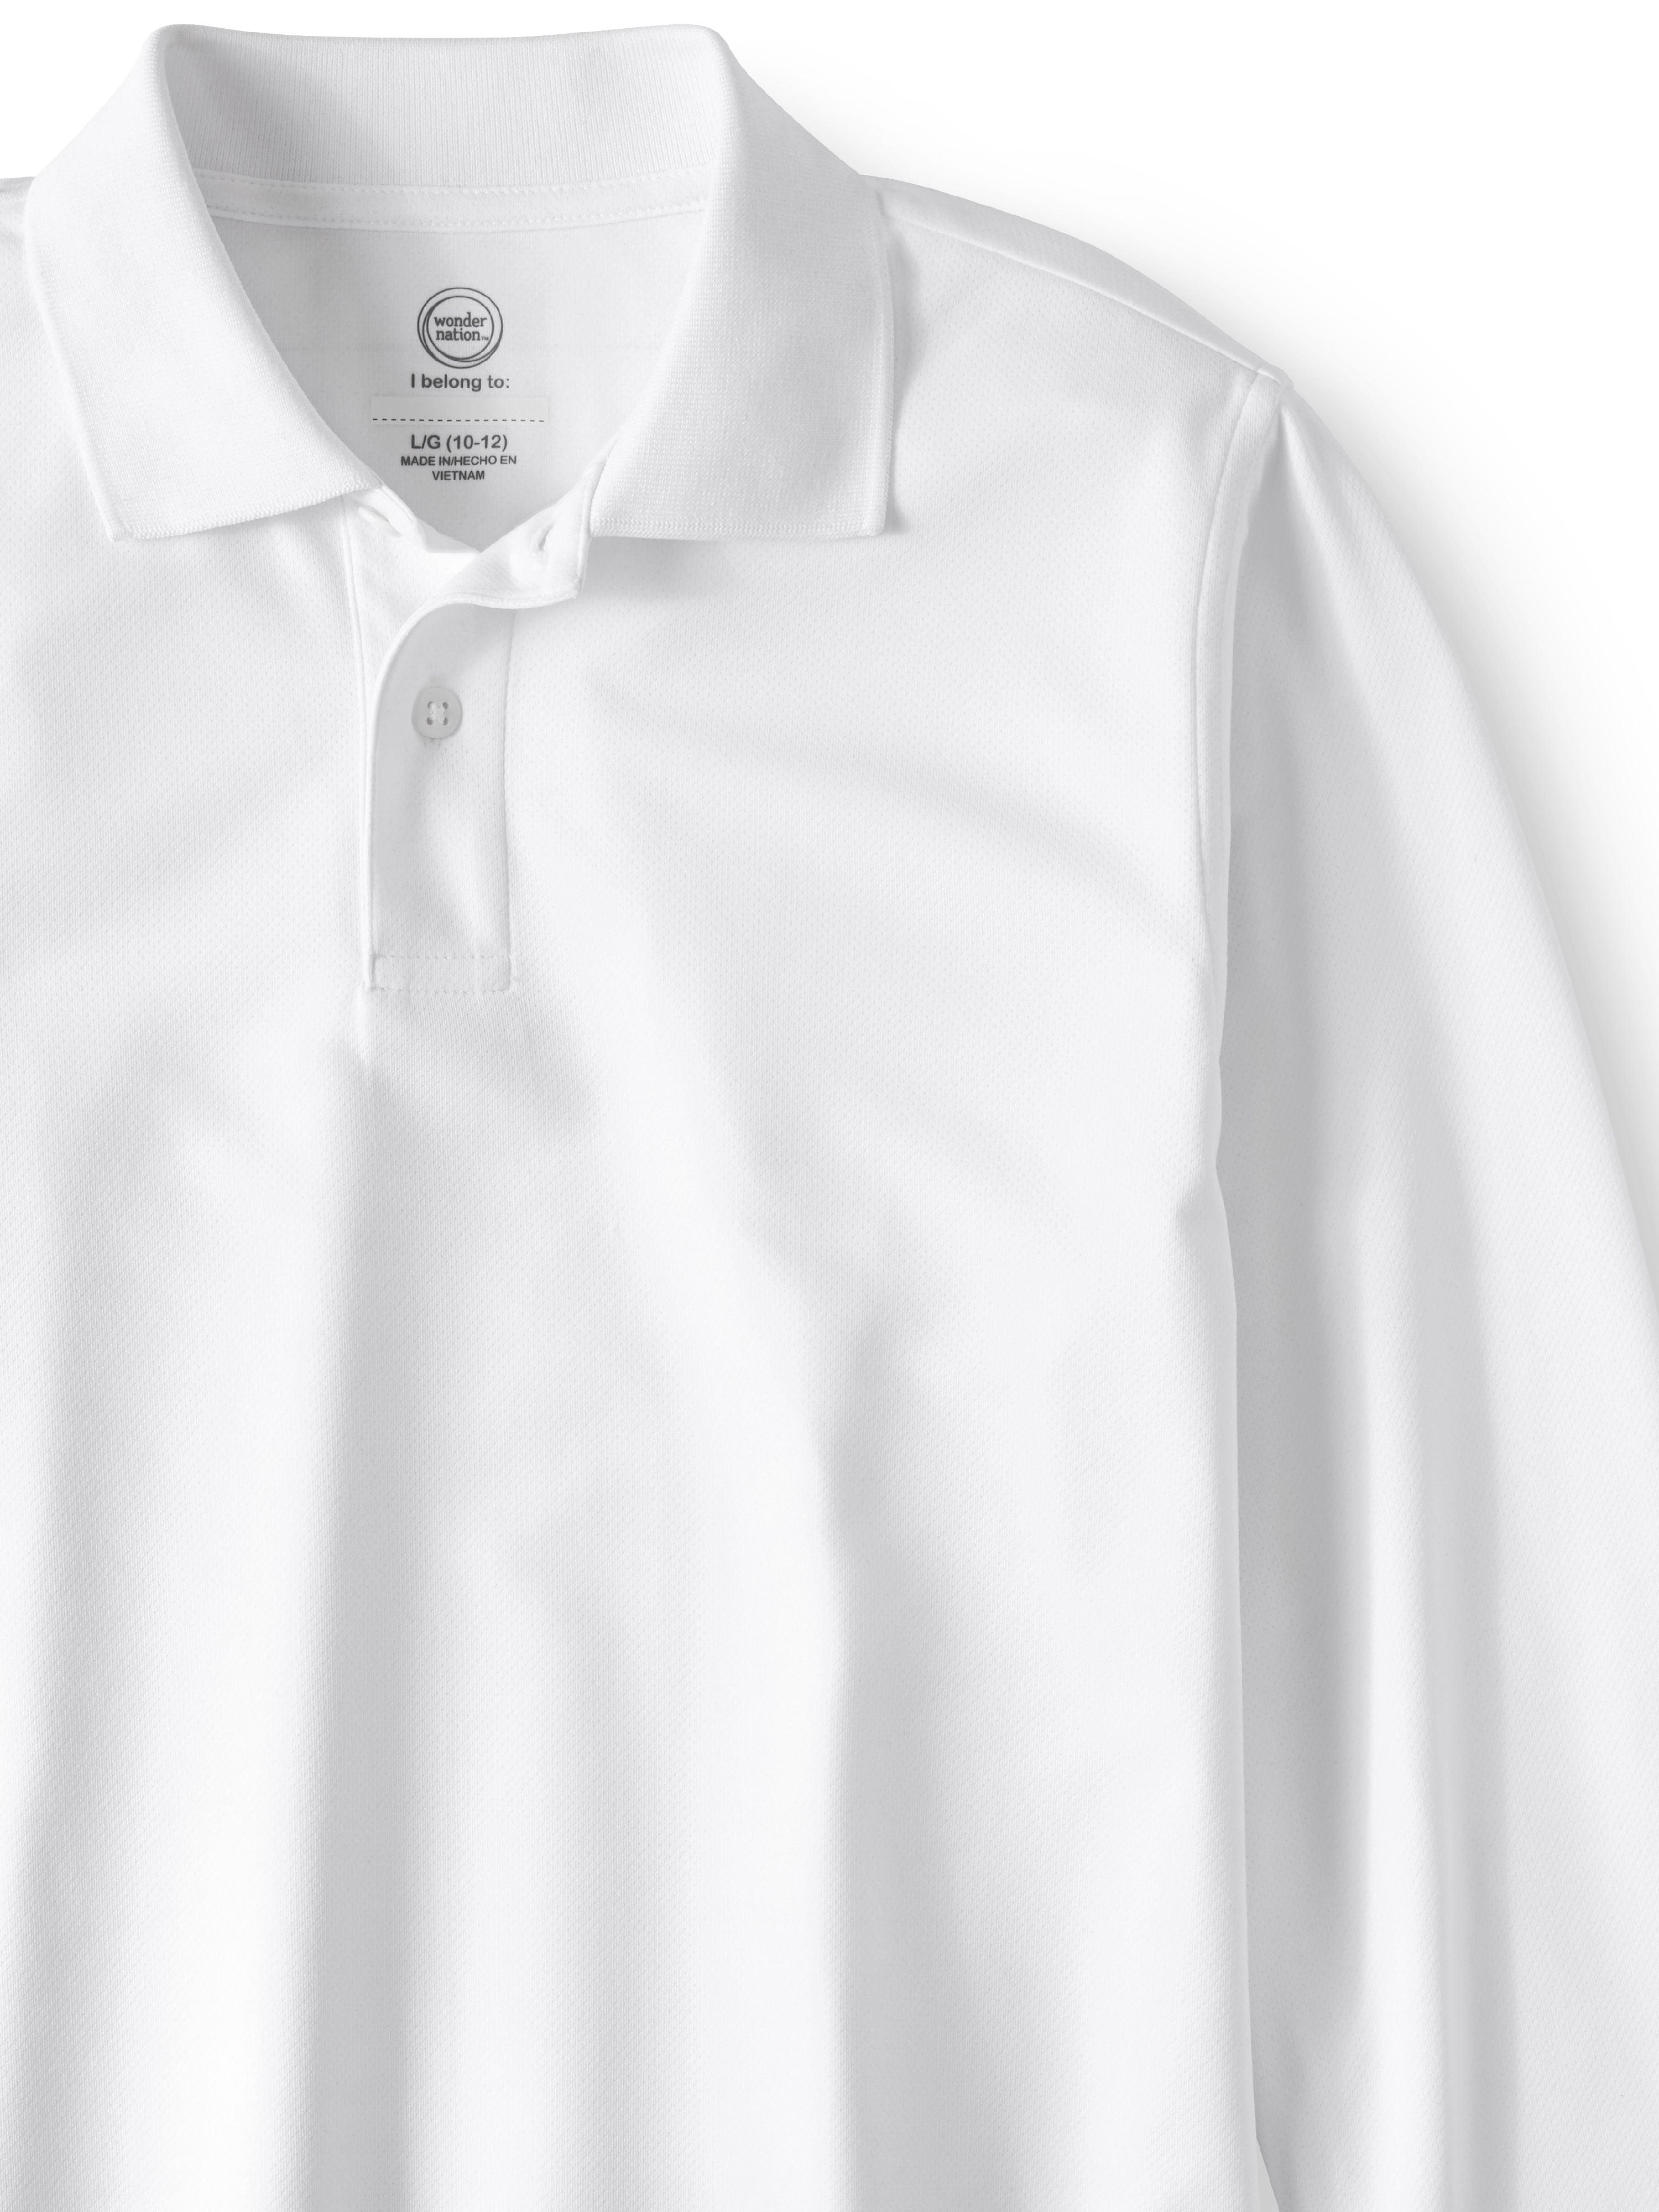 Performance Polo Shirt School Uniform No Fade Quick Dry Short Sleeve L2b Youth Athletic-Shirts